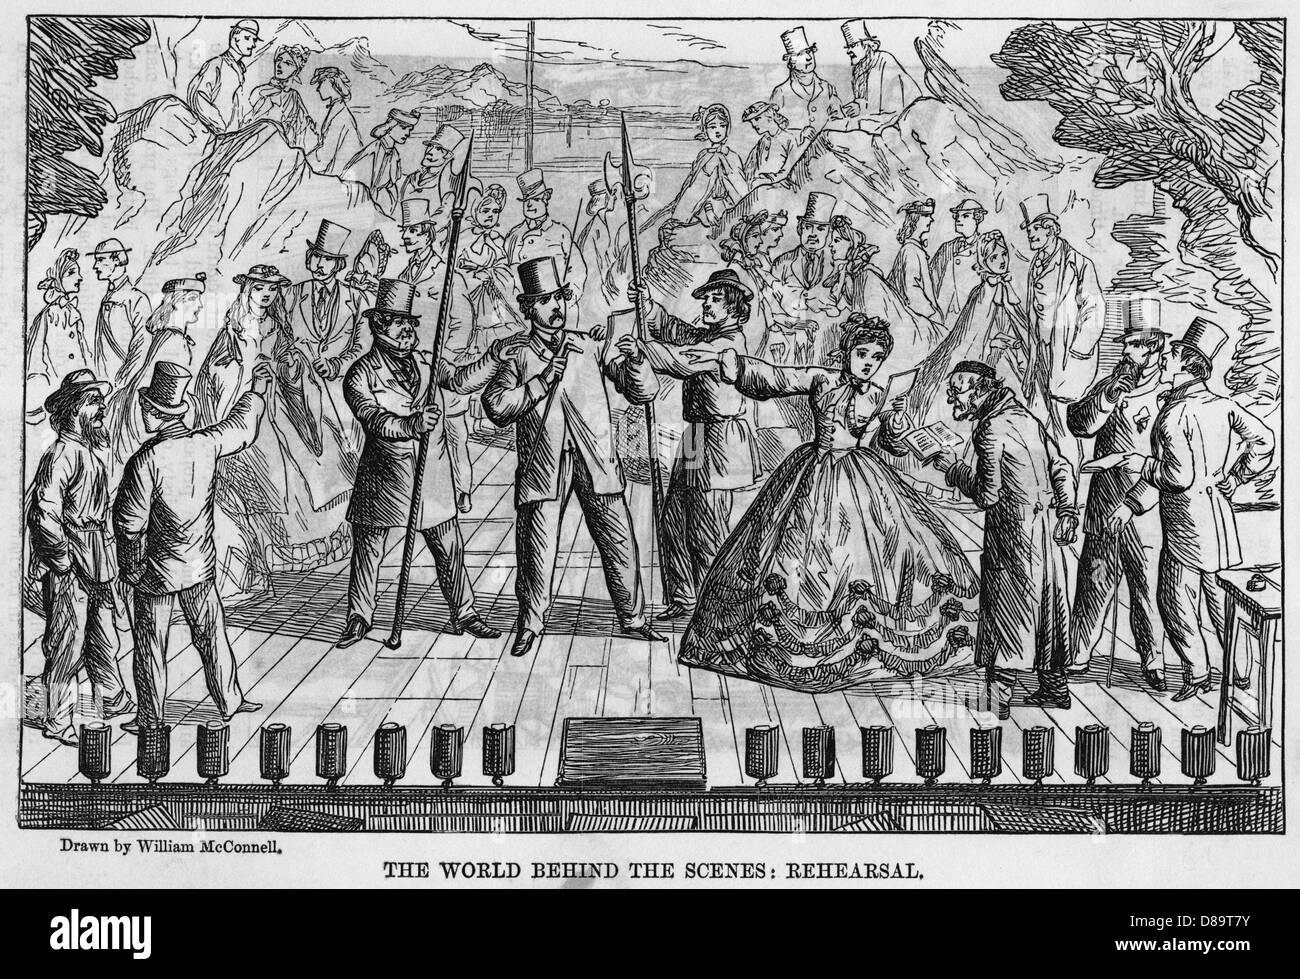 Rehearsing In 1863 - Stock Image